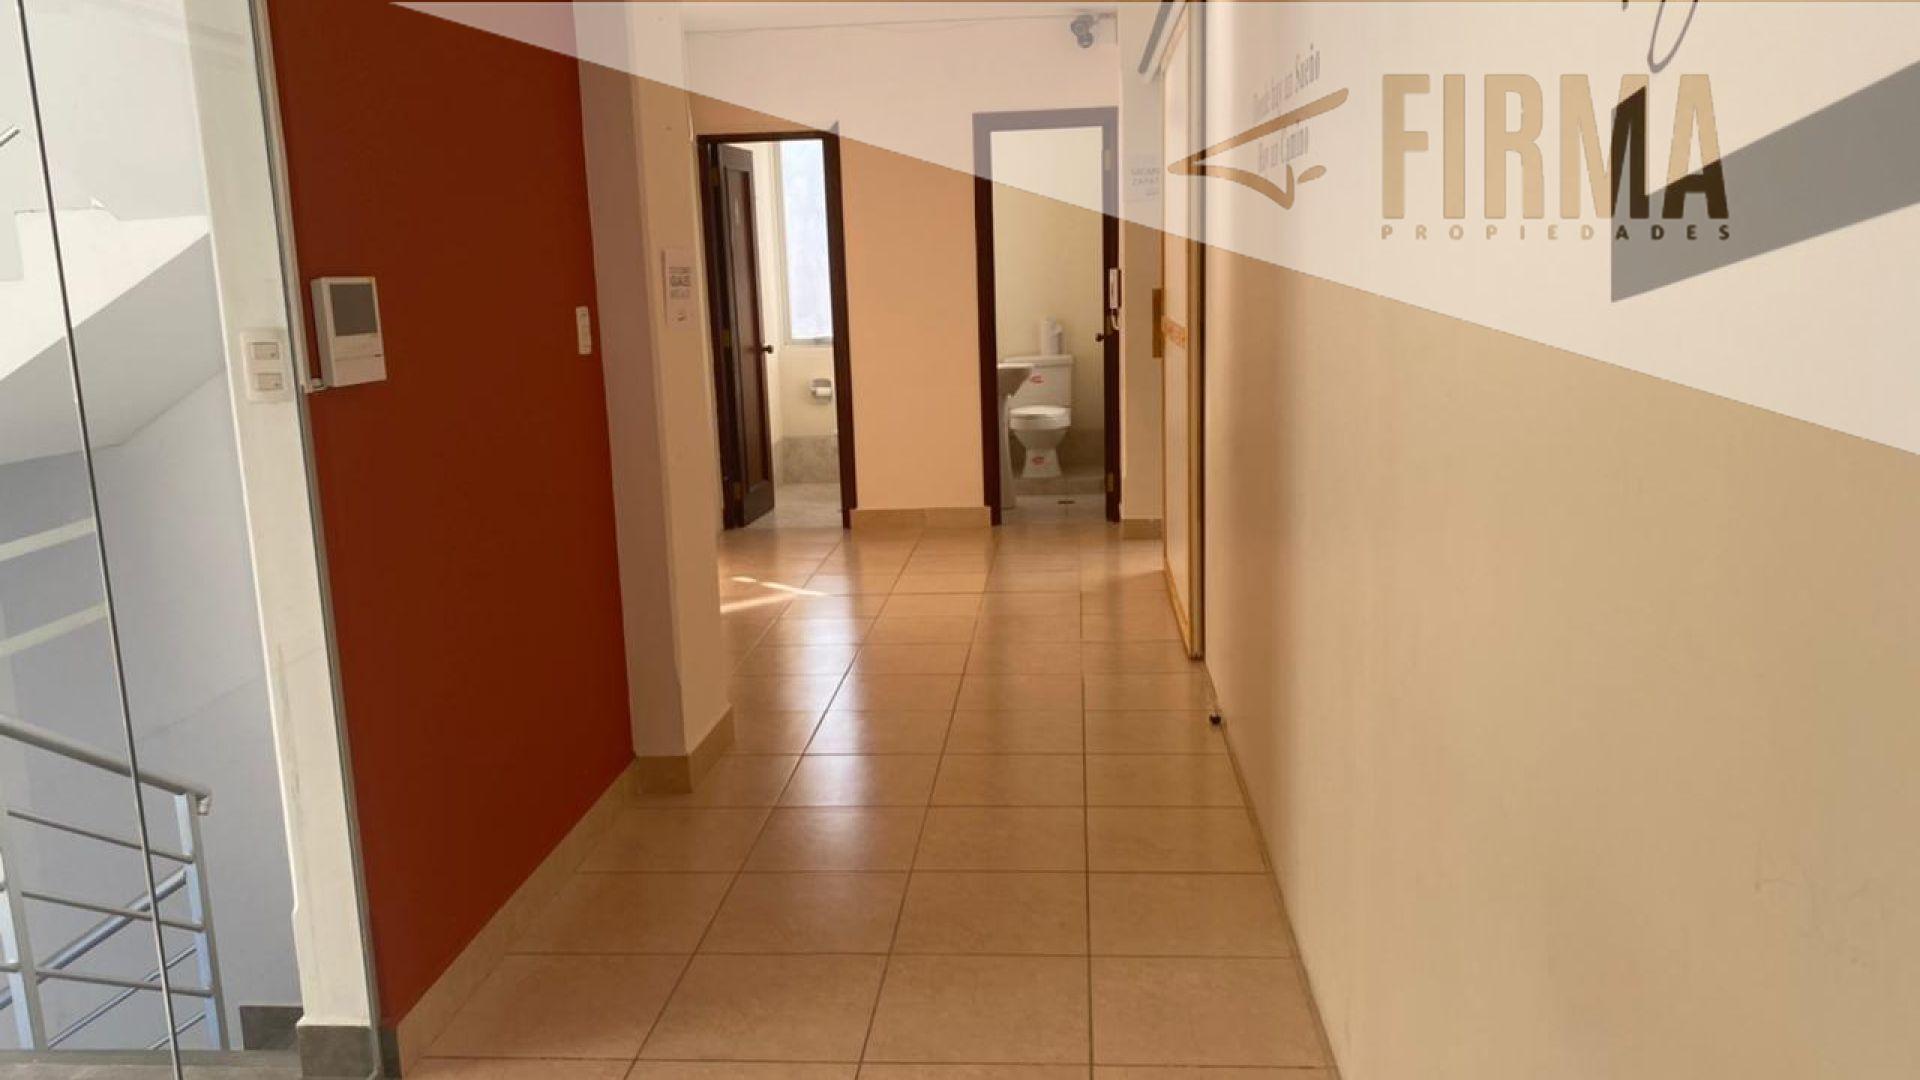 Oficina en Alquiler ALQUILA ESTA OFICINA EN CALACOTO Foto 7